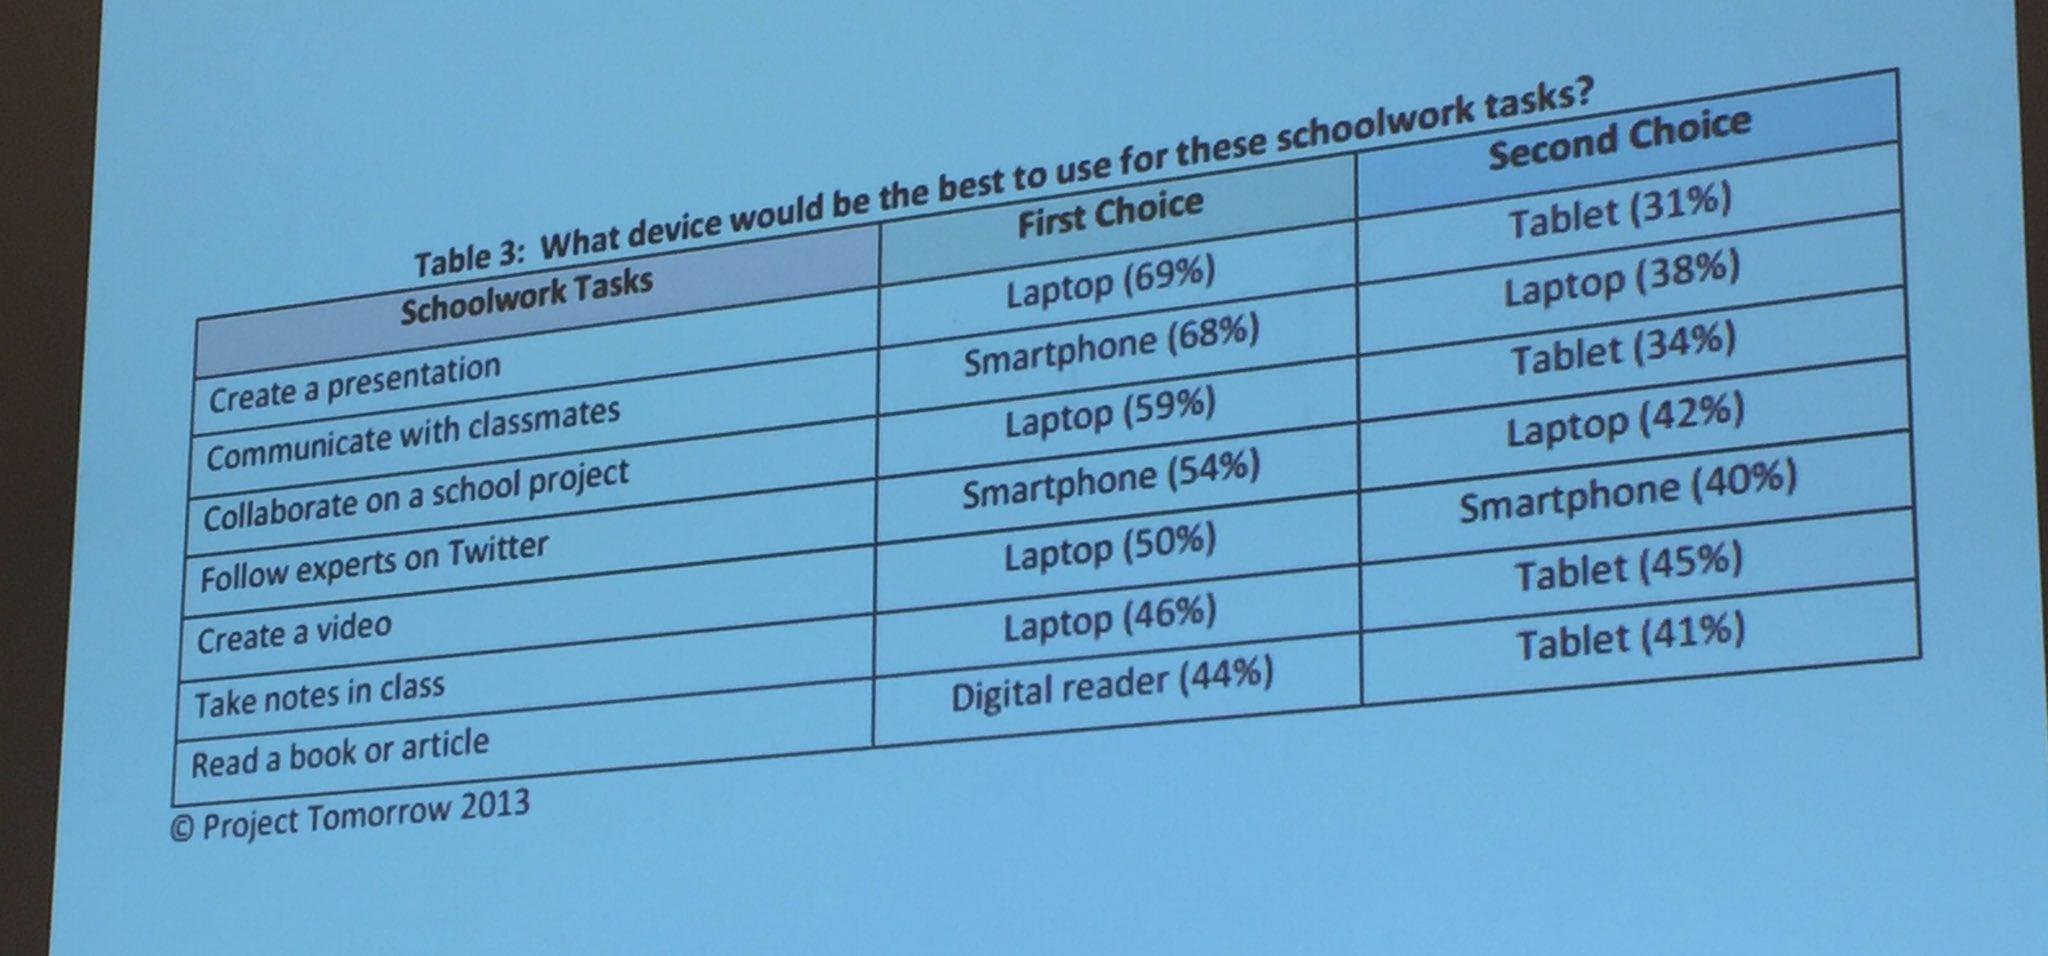 Physical keyboards are not dead. Students prefer them for many tasks. #fcpsiste https://t.co/xCJB18Nstx